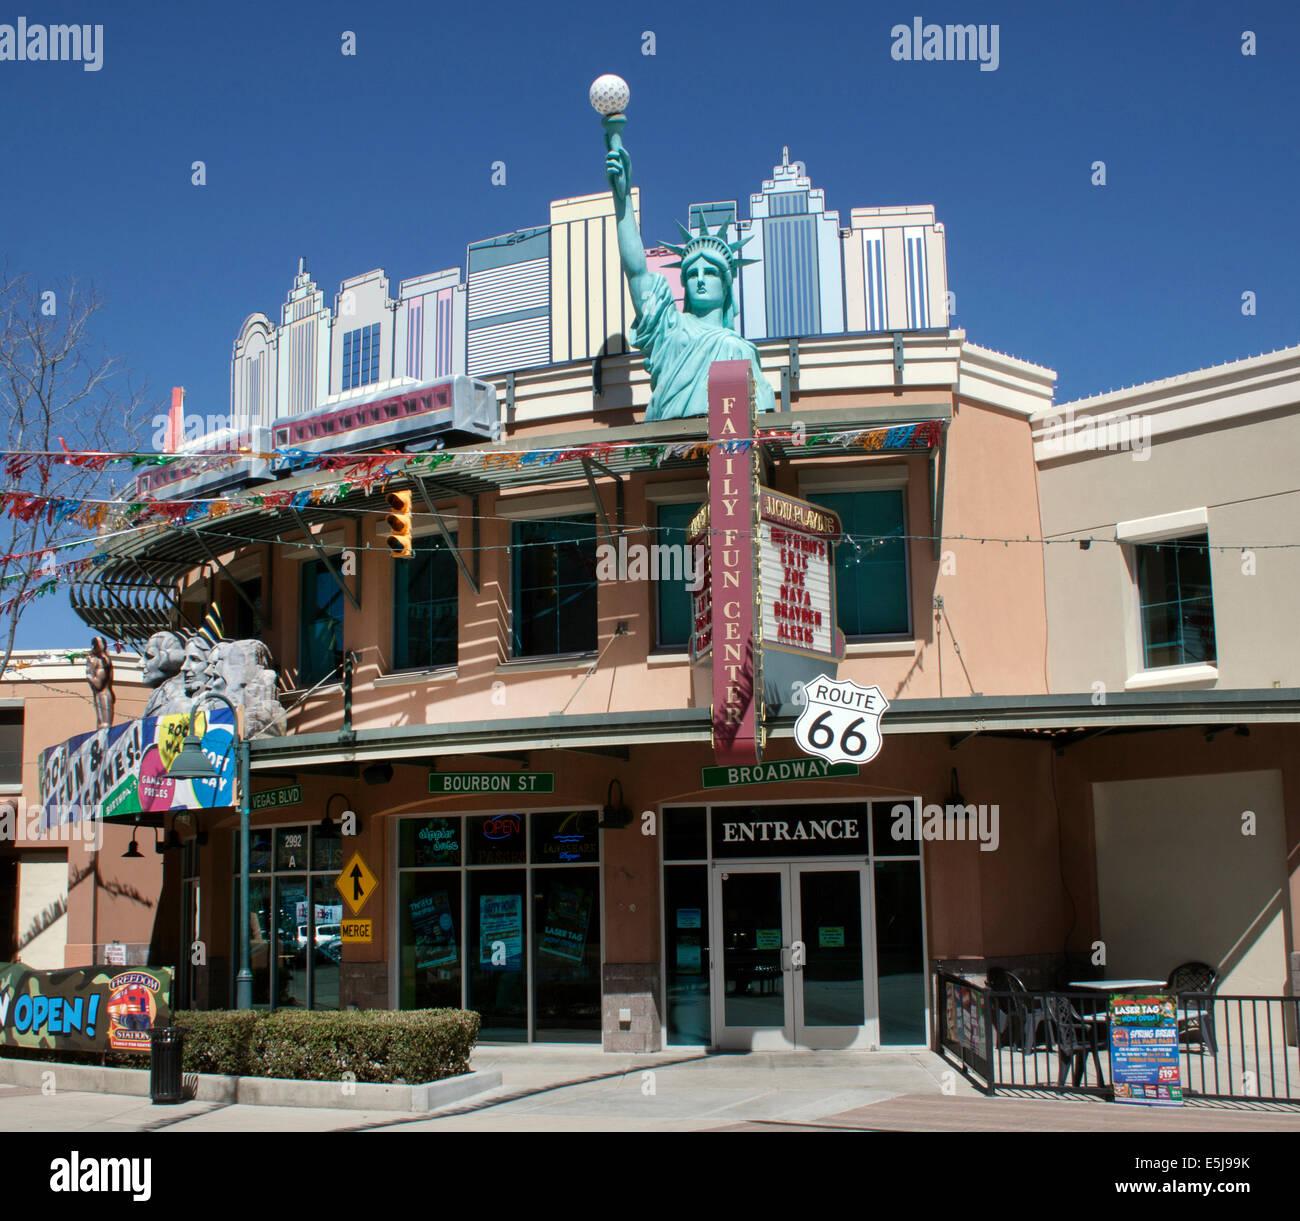 American Landmarks at a mall in Prescott Valley Arizona - Stock Image